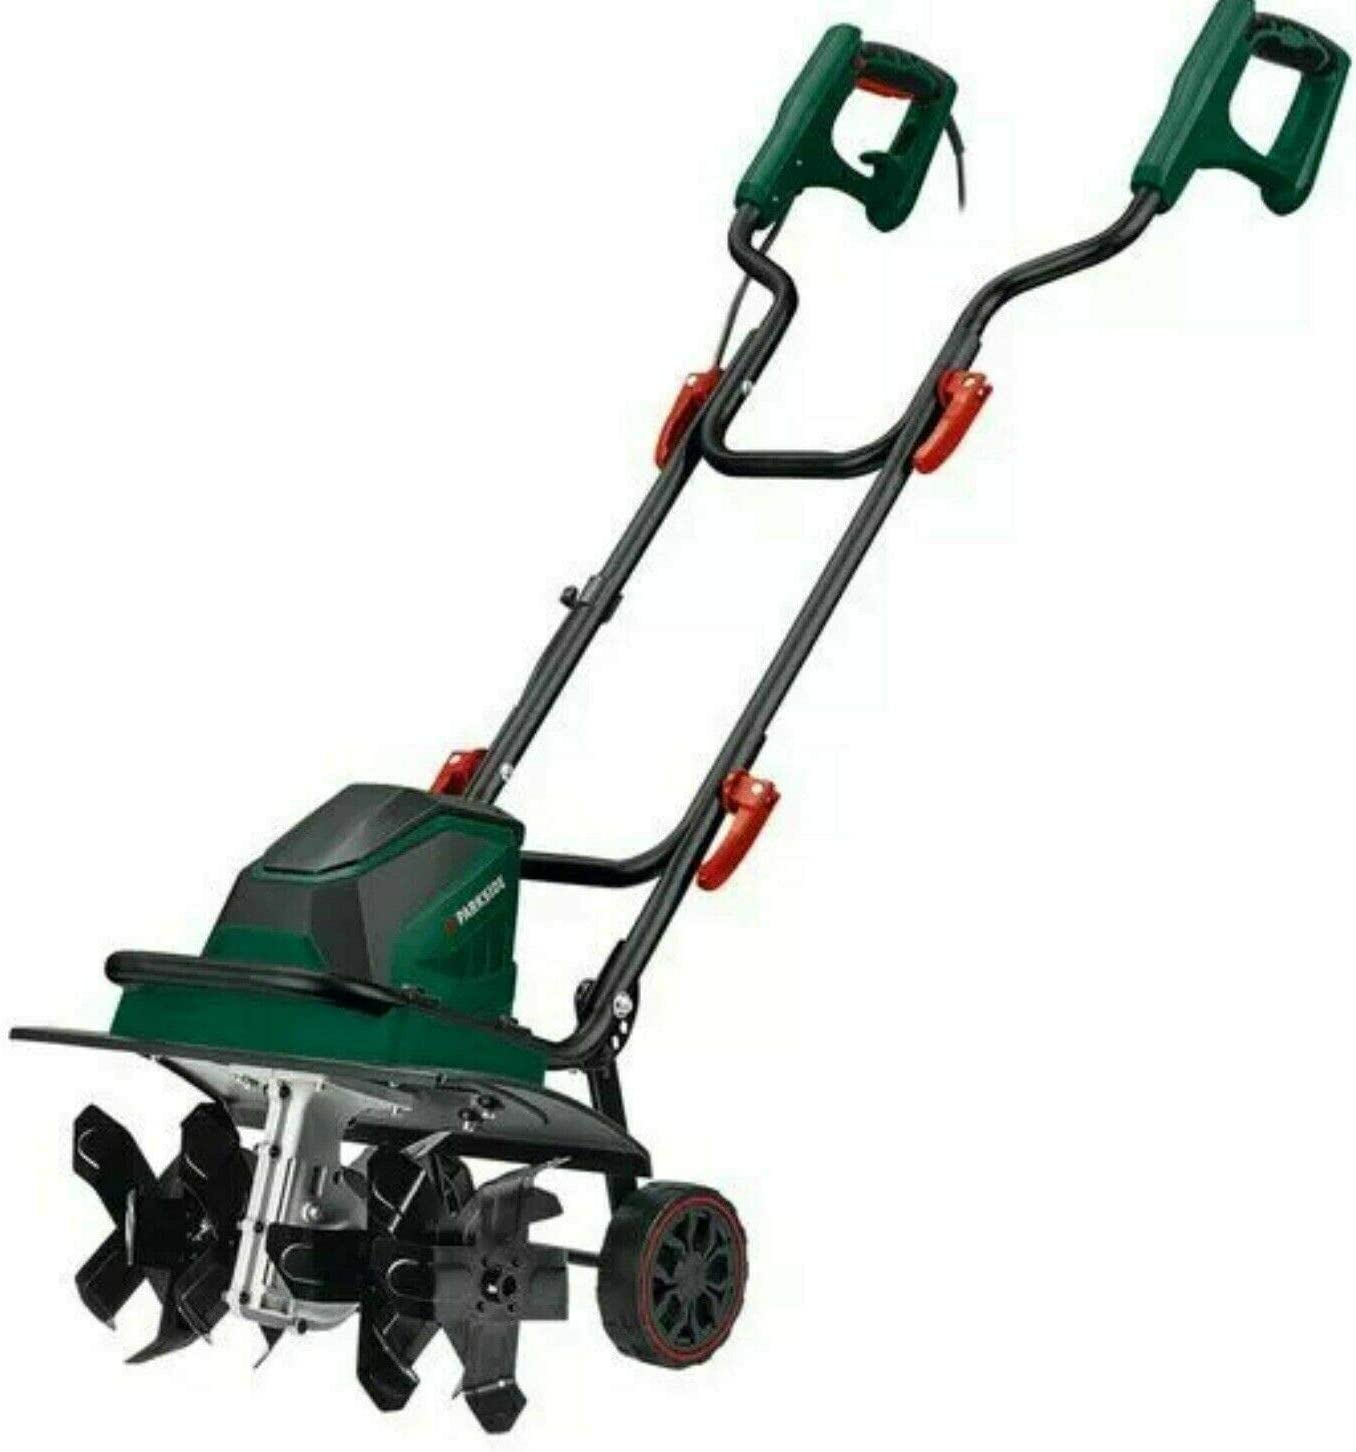 Kompernass Parkside Rotavator//Tiller to Prepare Soil for New Lawns Vegetable or Fruit plots